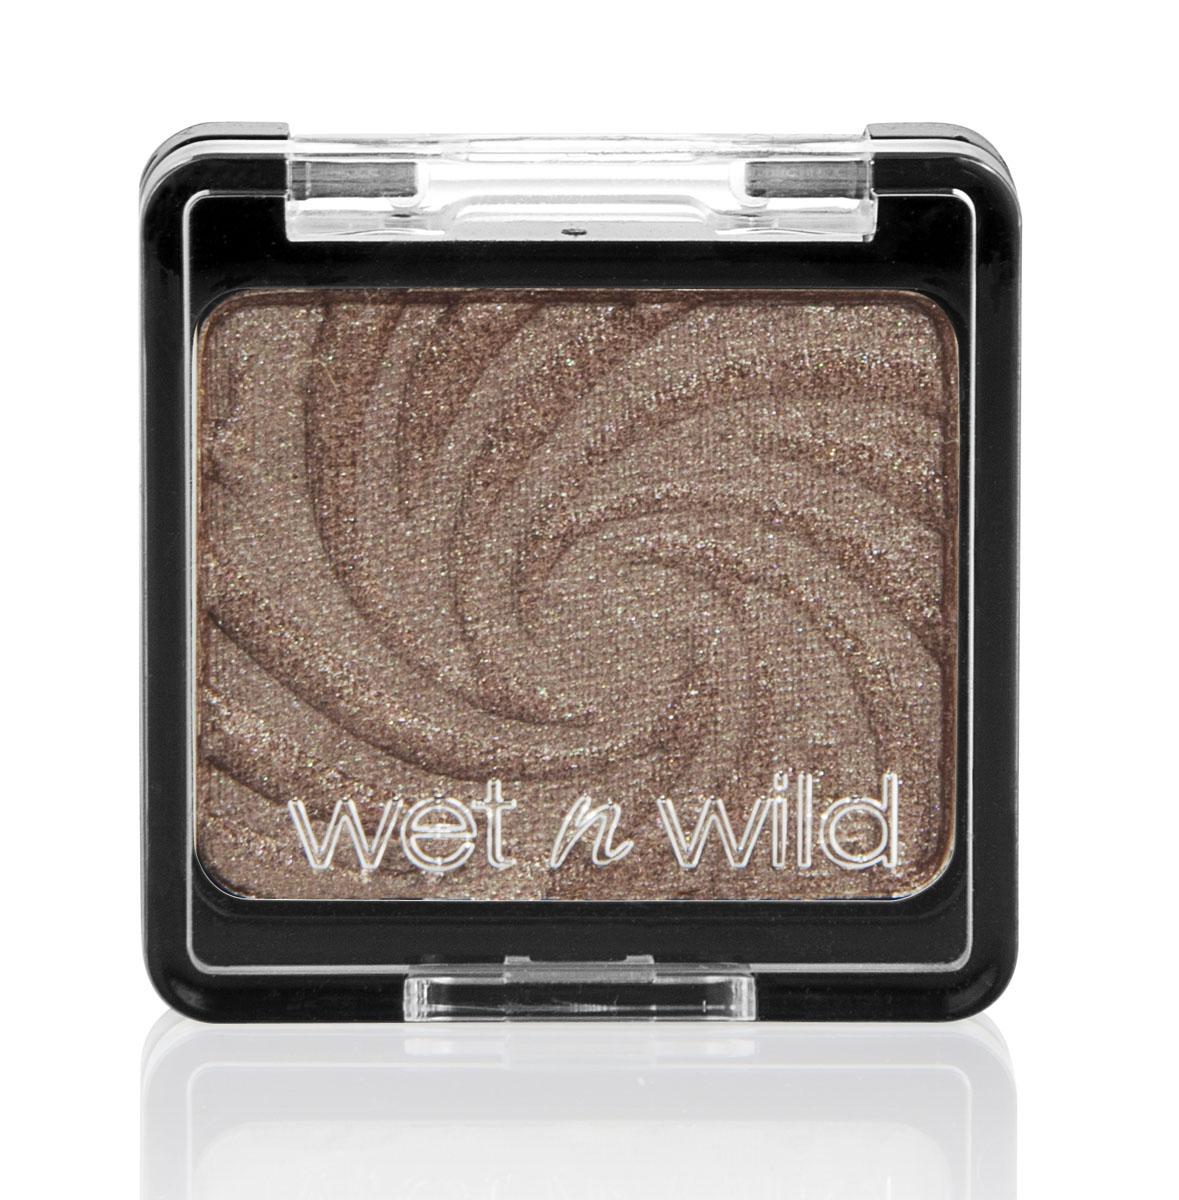 Wet n Wild Тени Для Век Одноцветные Color Icon Eyeshadow Single nutty 2 гр